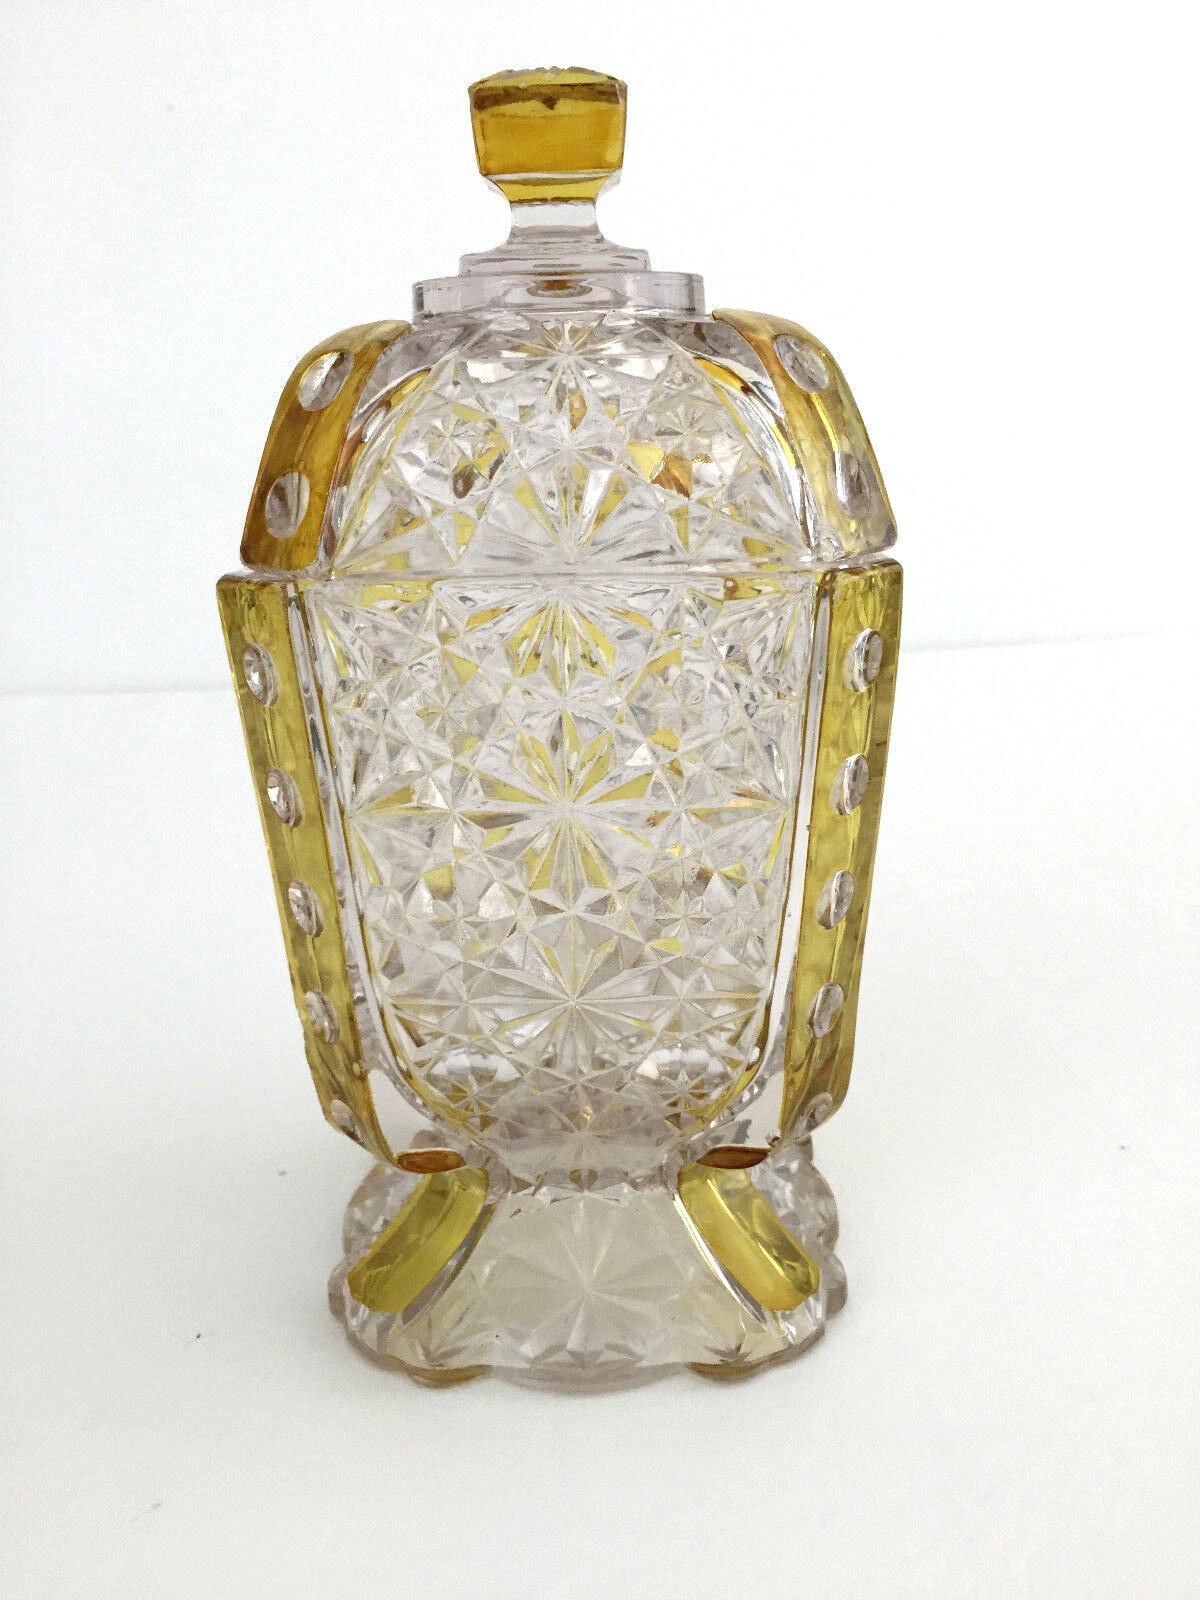 Antique Victorian Duncan & Miller clair verre pressé Sugar Bowl amberette 1890 S